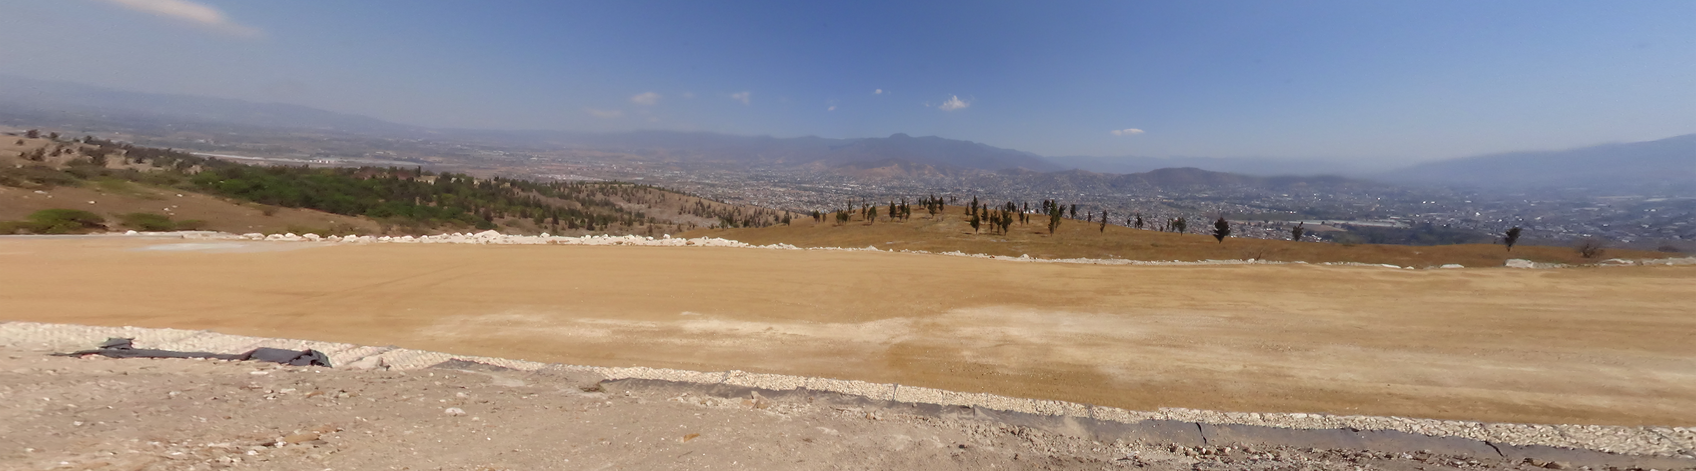 Oaxaca Mexico View Pano 01 by ALCHEMlST